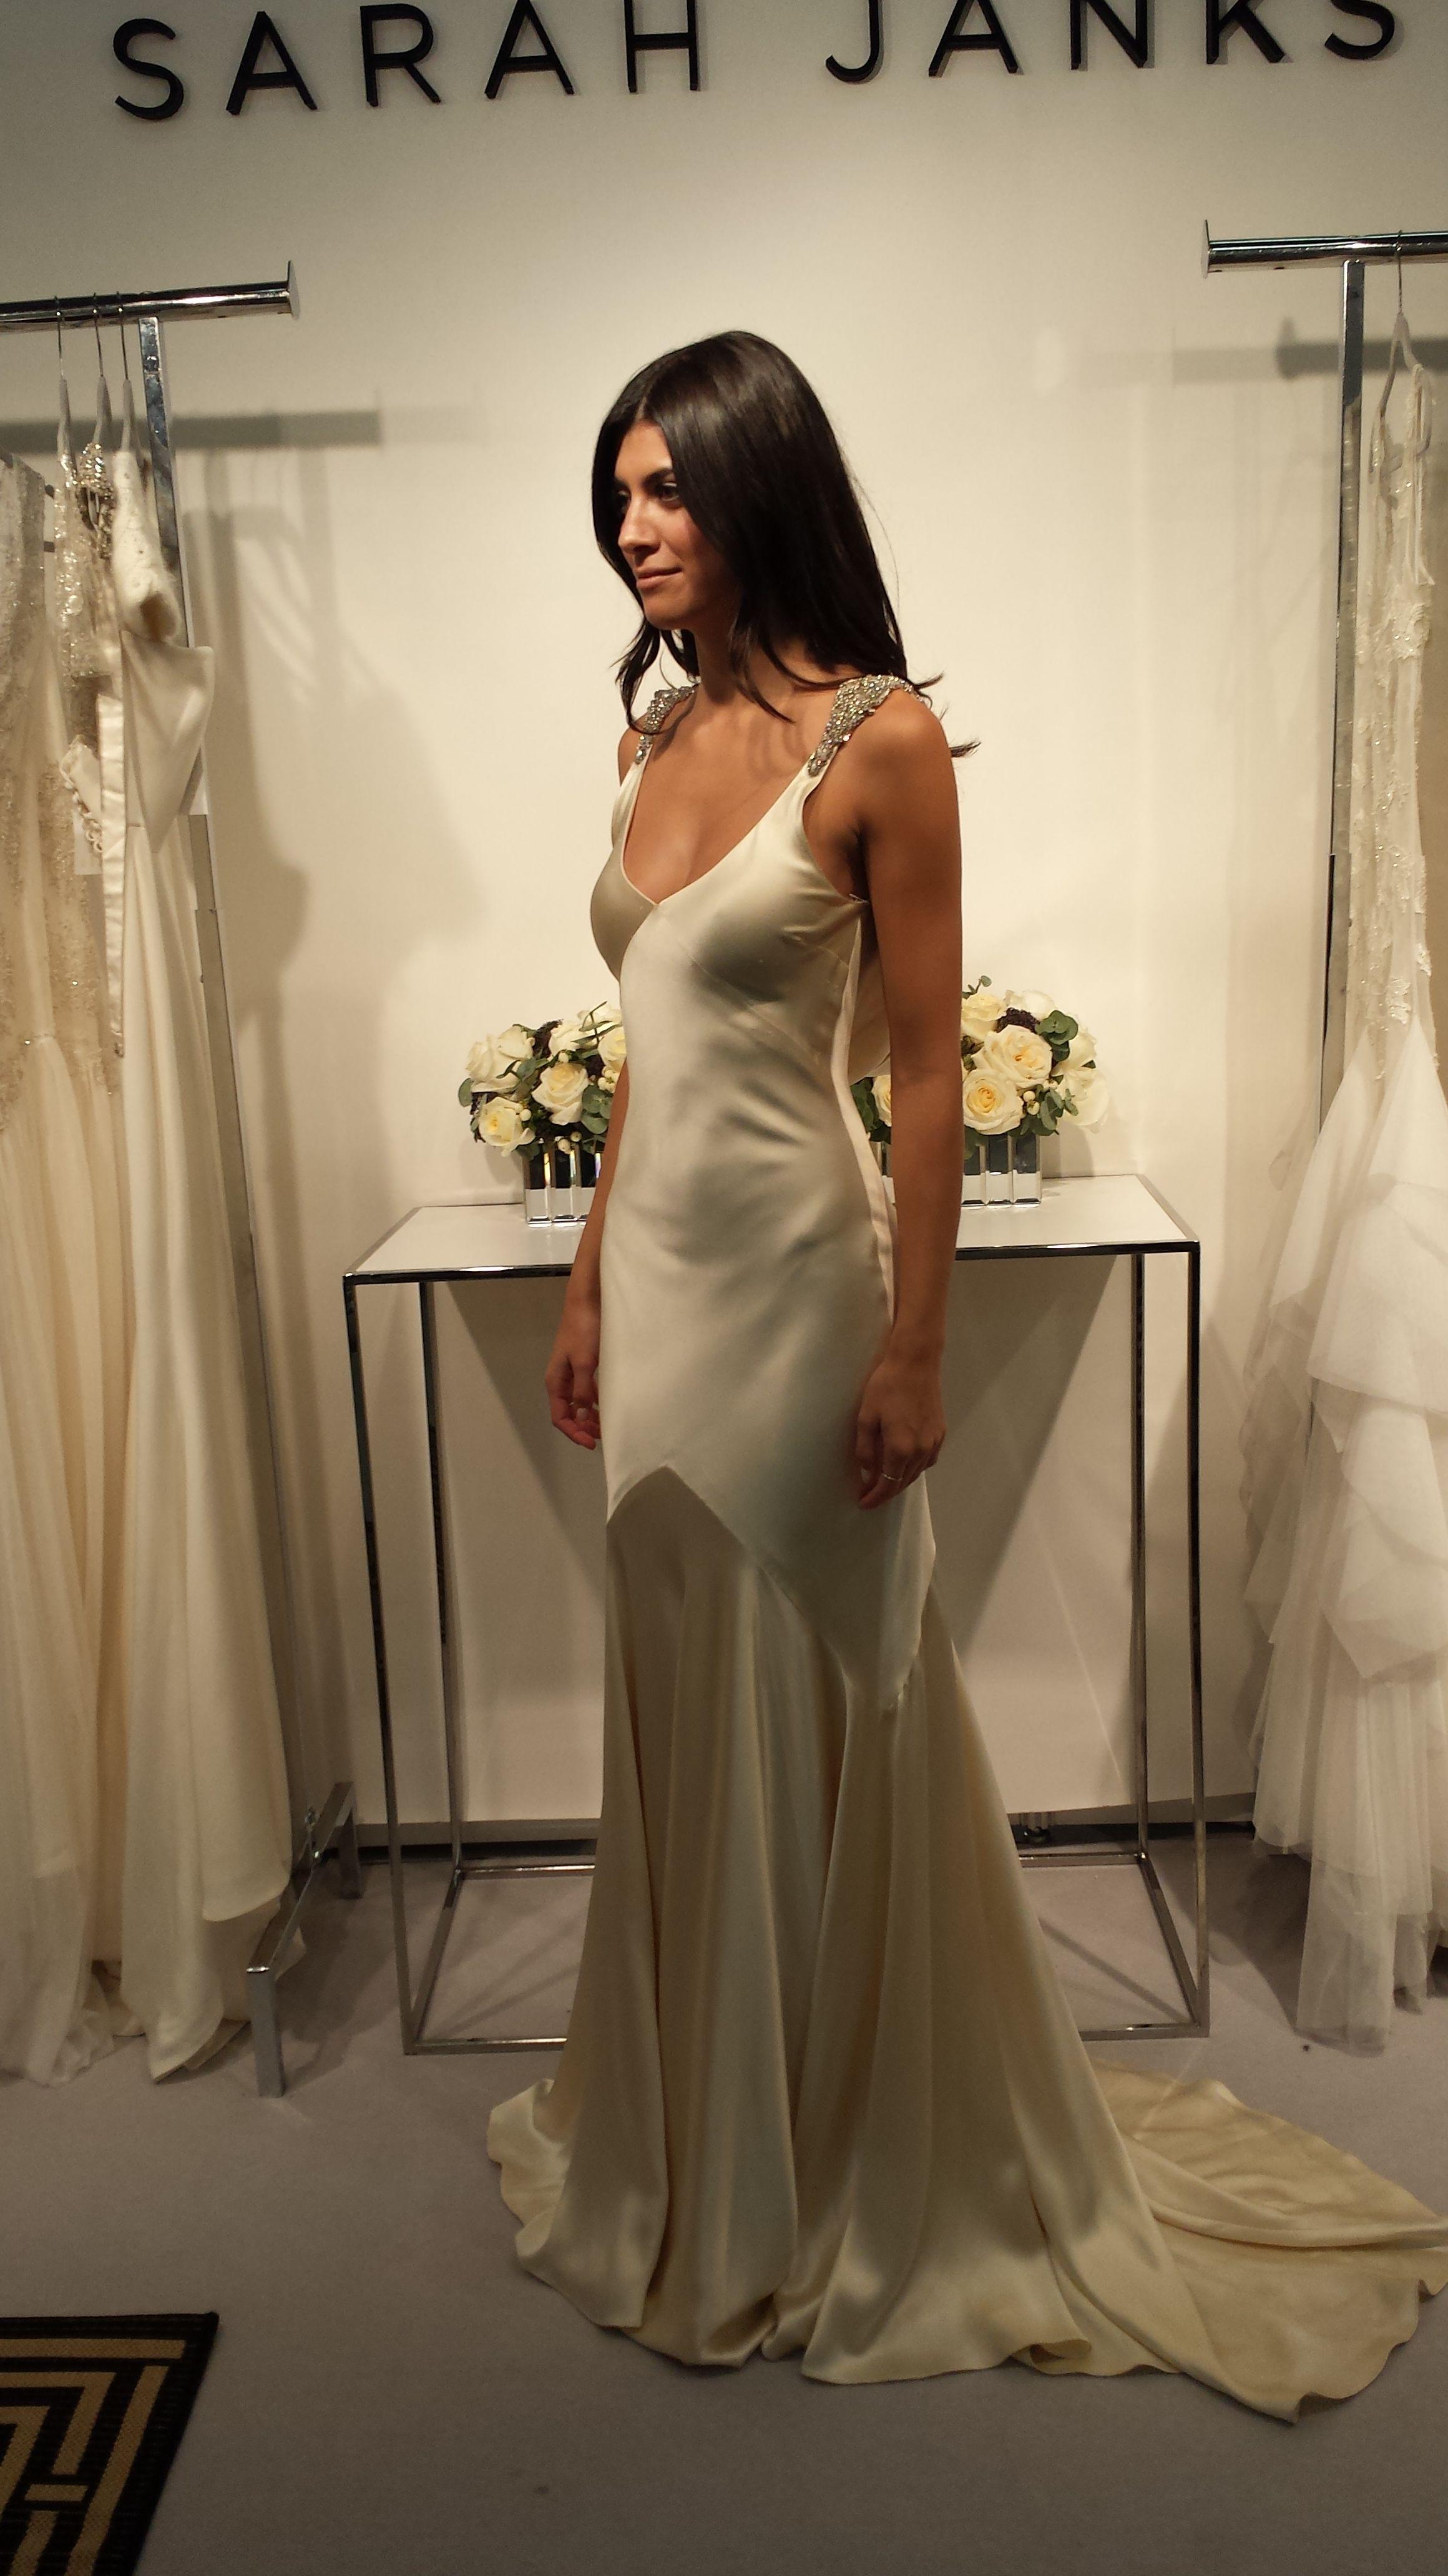 Bias-cut silk charmeuse is so divine...and glamorous! Sarah Janks ...